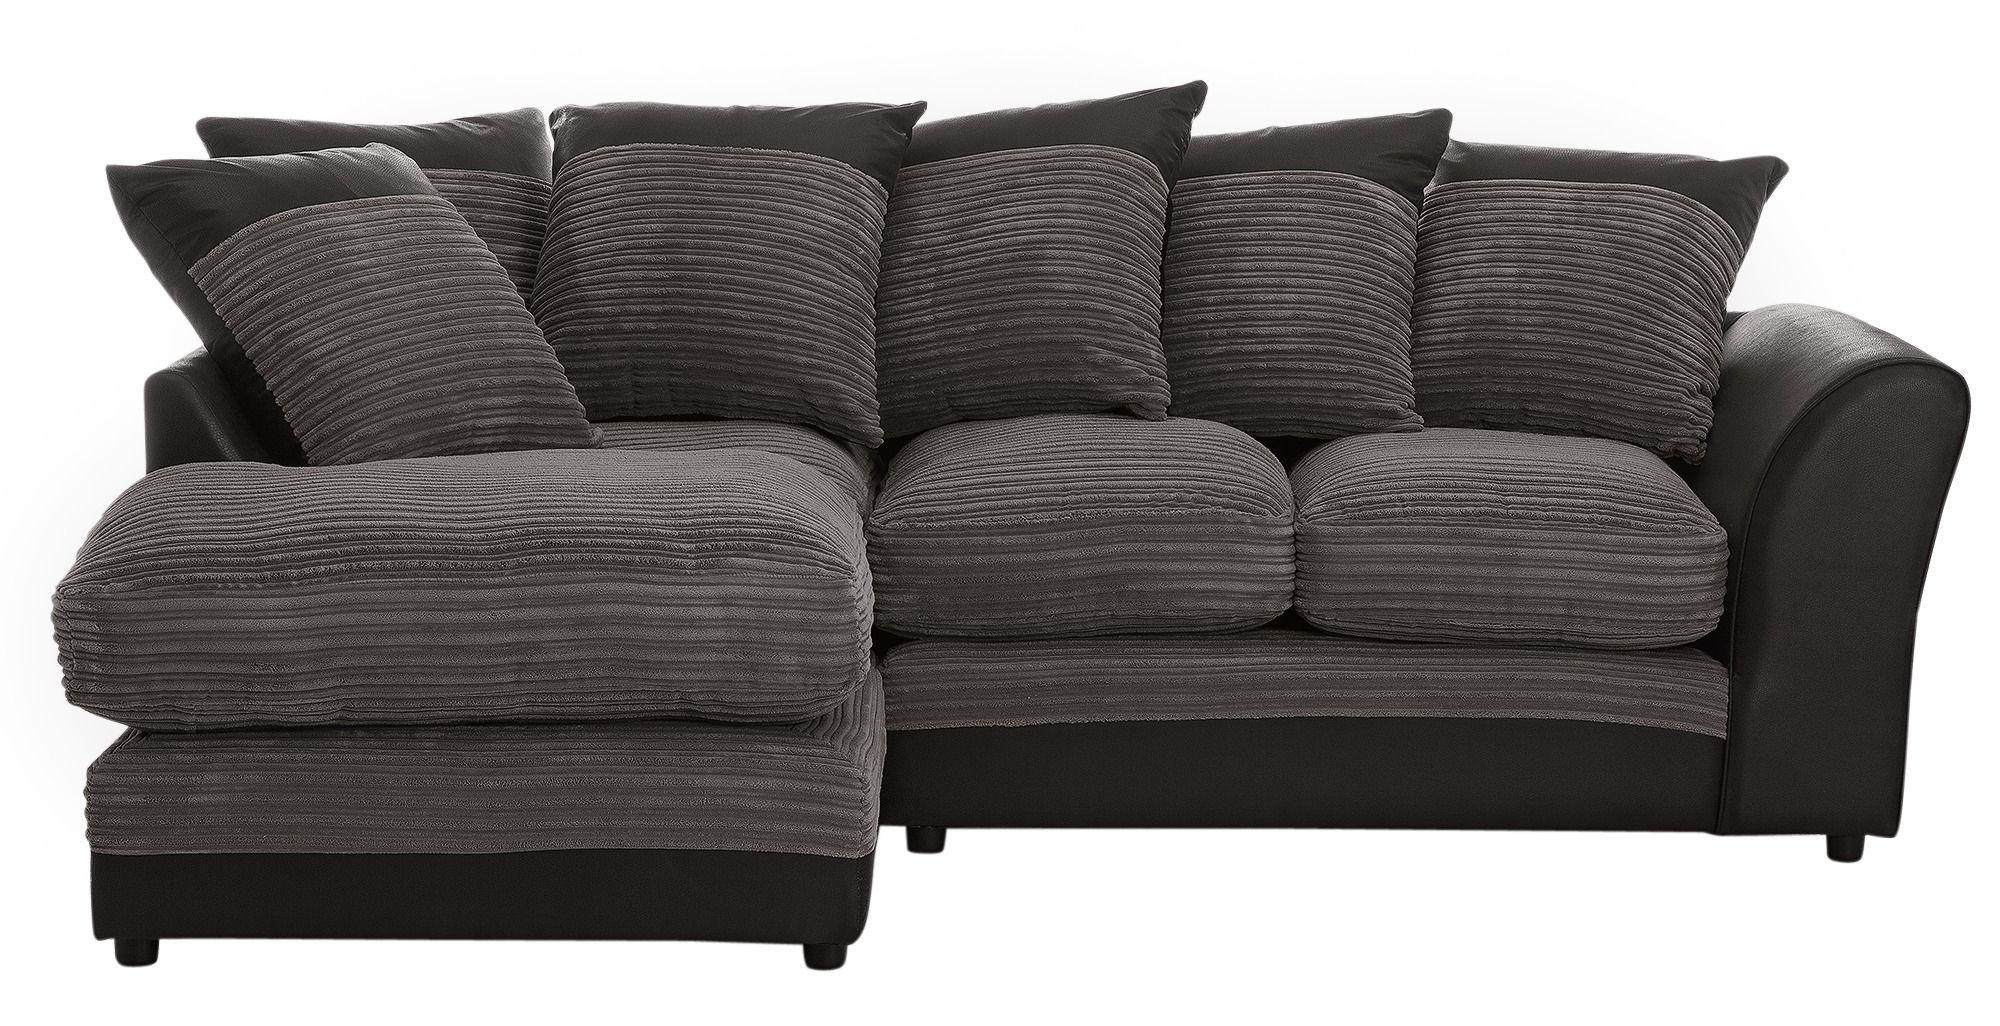 'Home - Harley Regular - Fabric Left Hand Corner Sofa - Charcoal